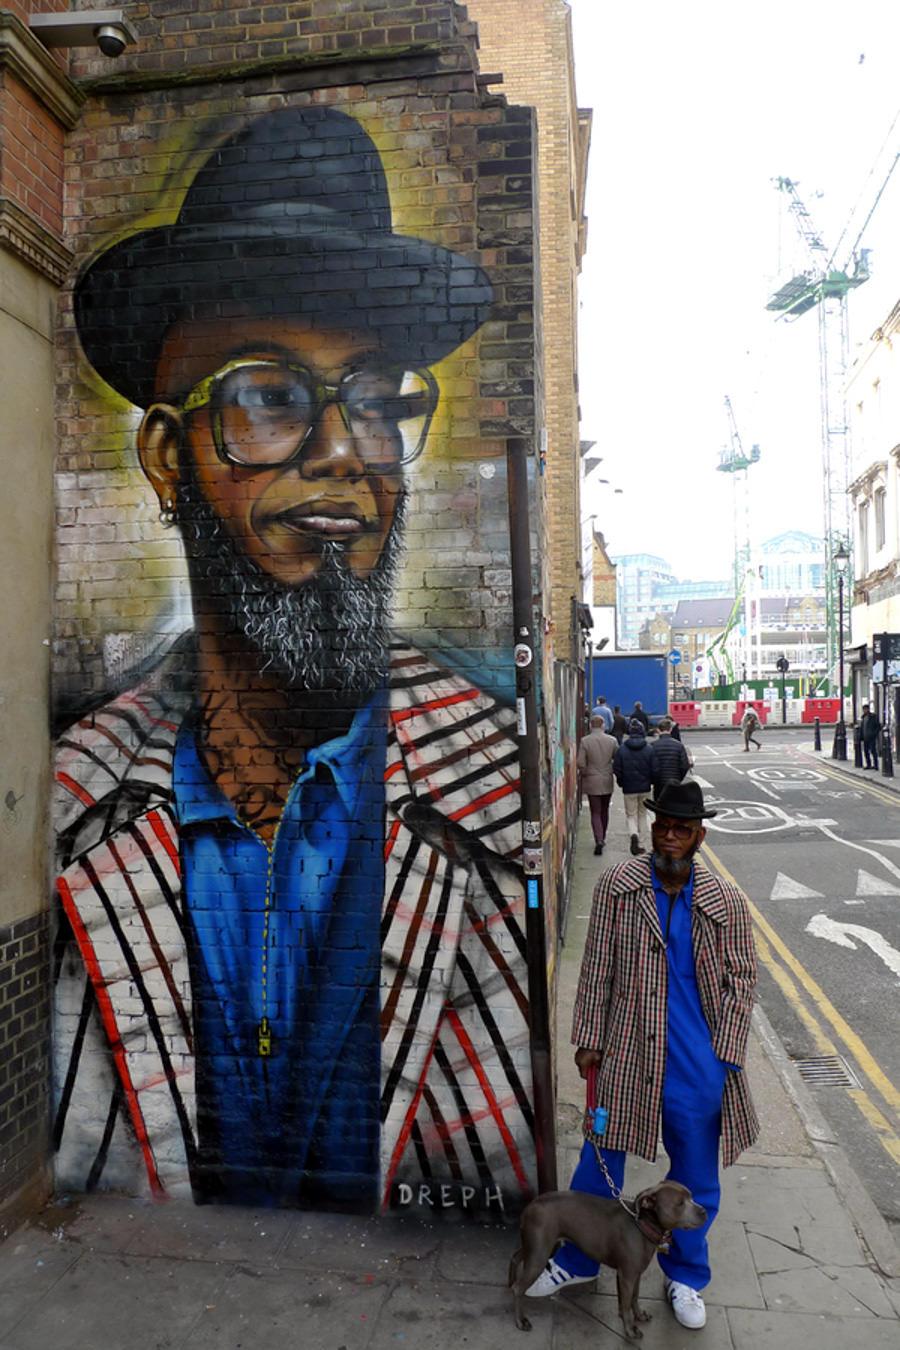 Neequaye Dreph Street Art